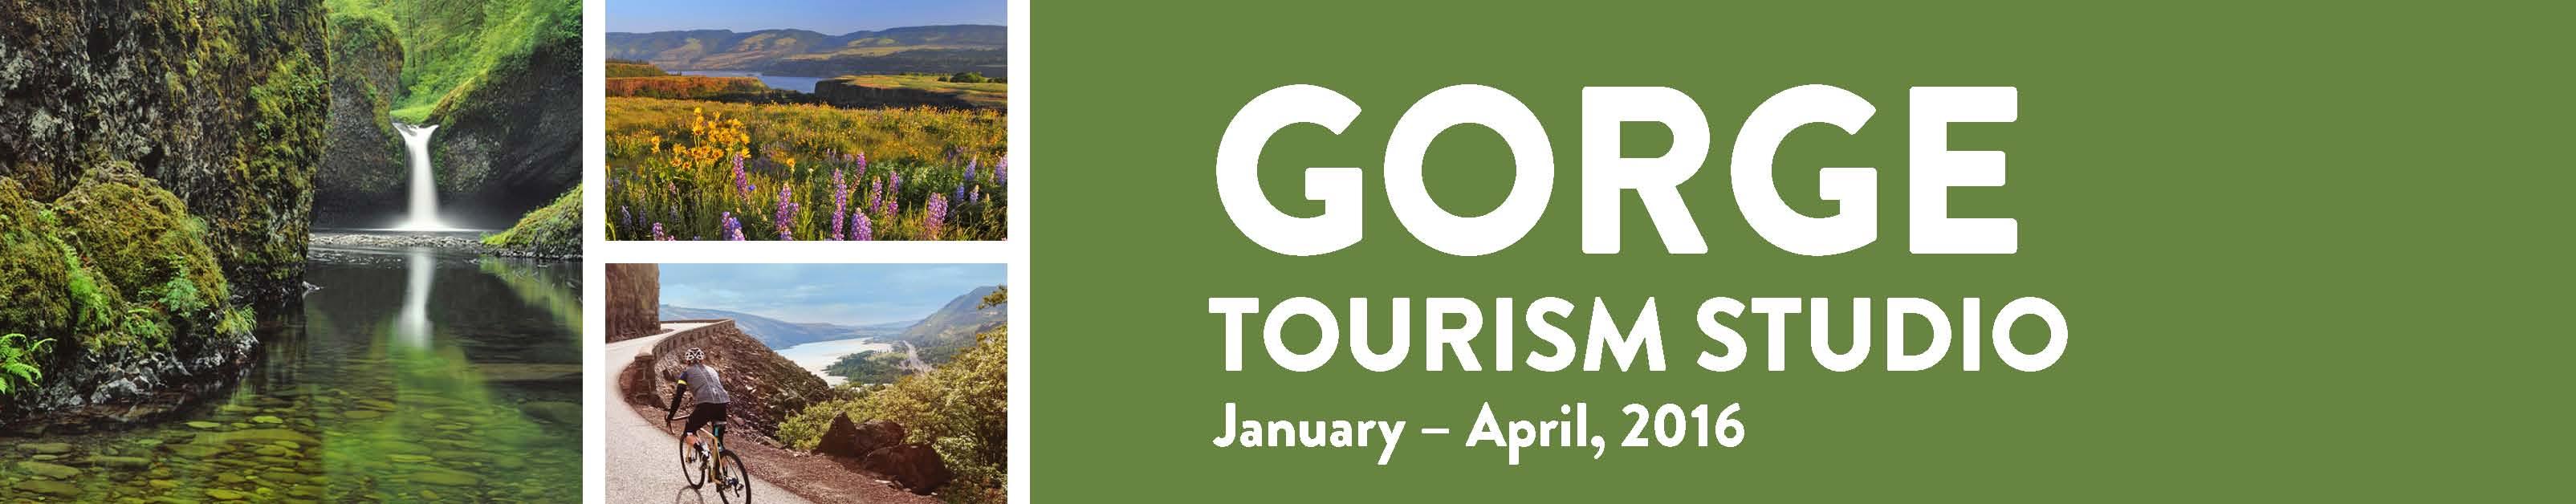 Gorge Tourism Studio